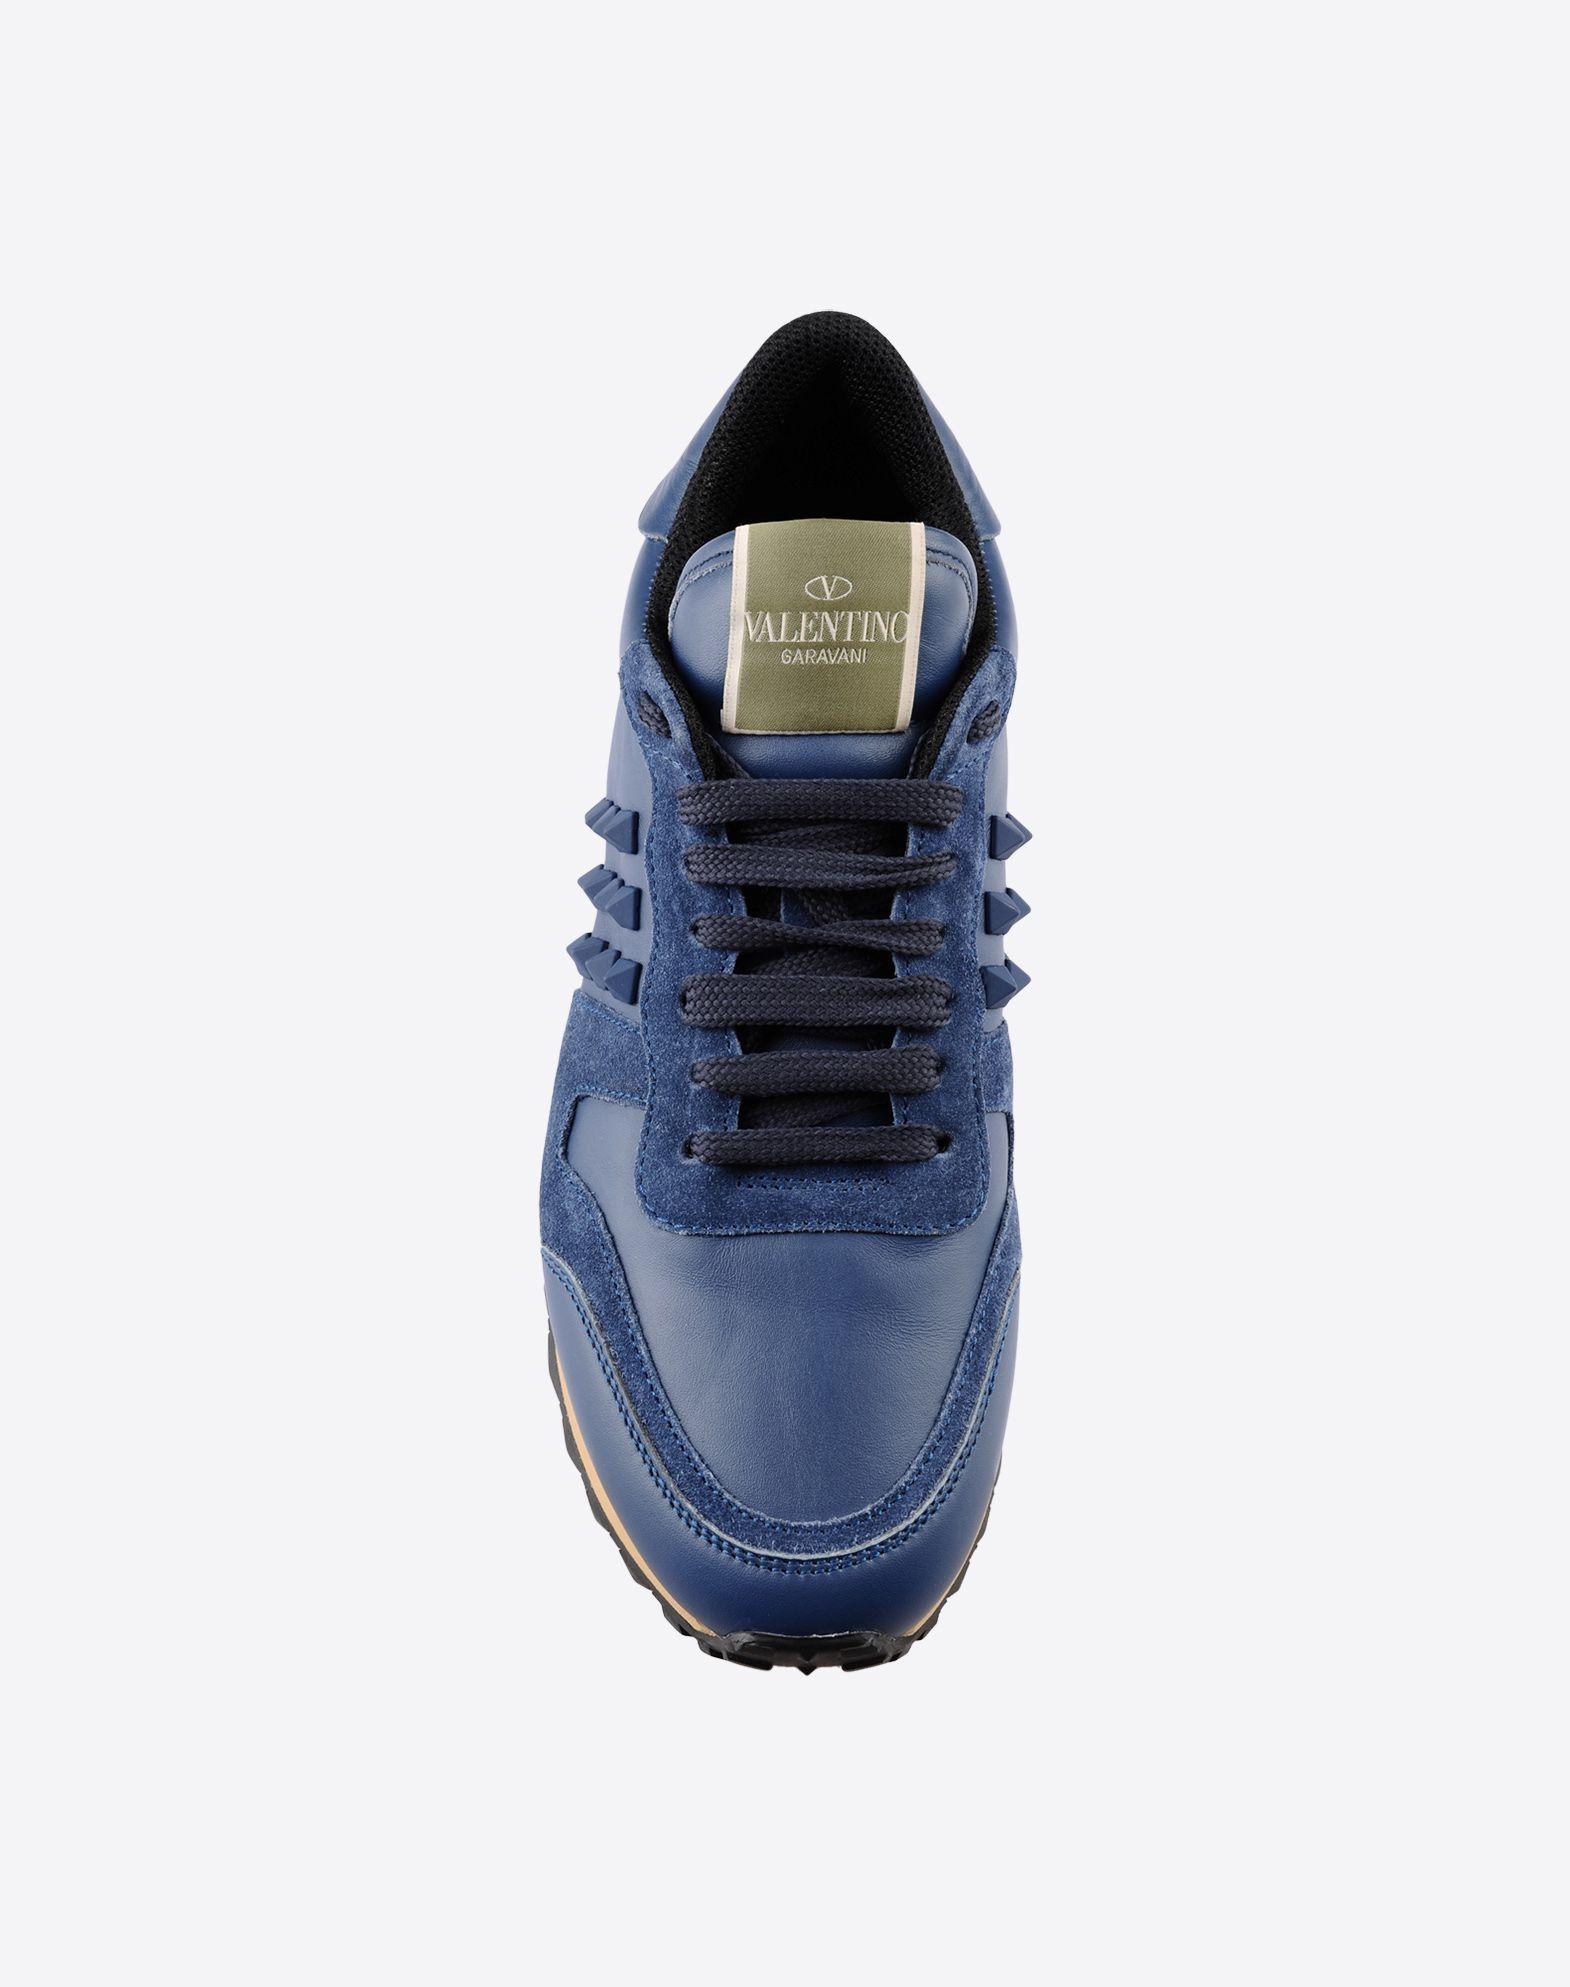 133259c77676 Valentino Women Rockstud Sneaker